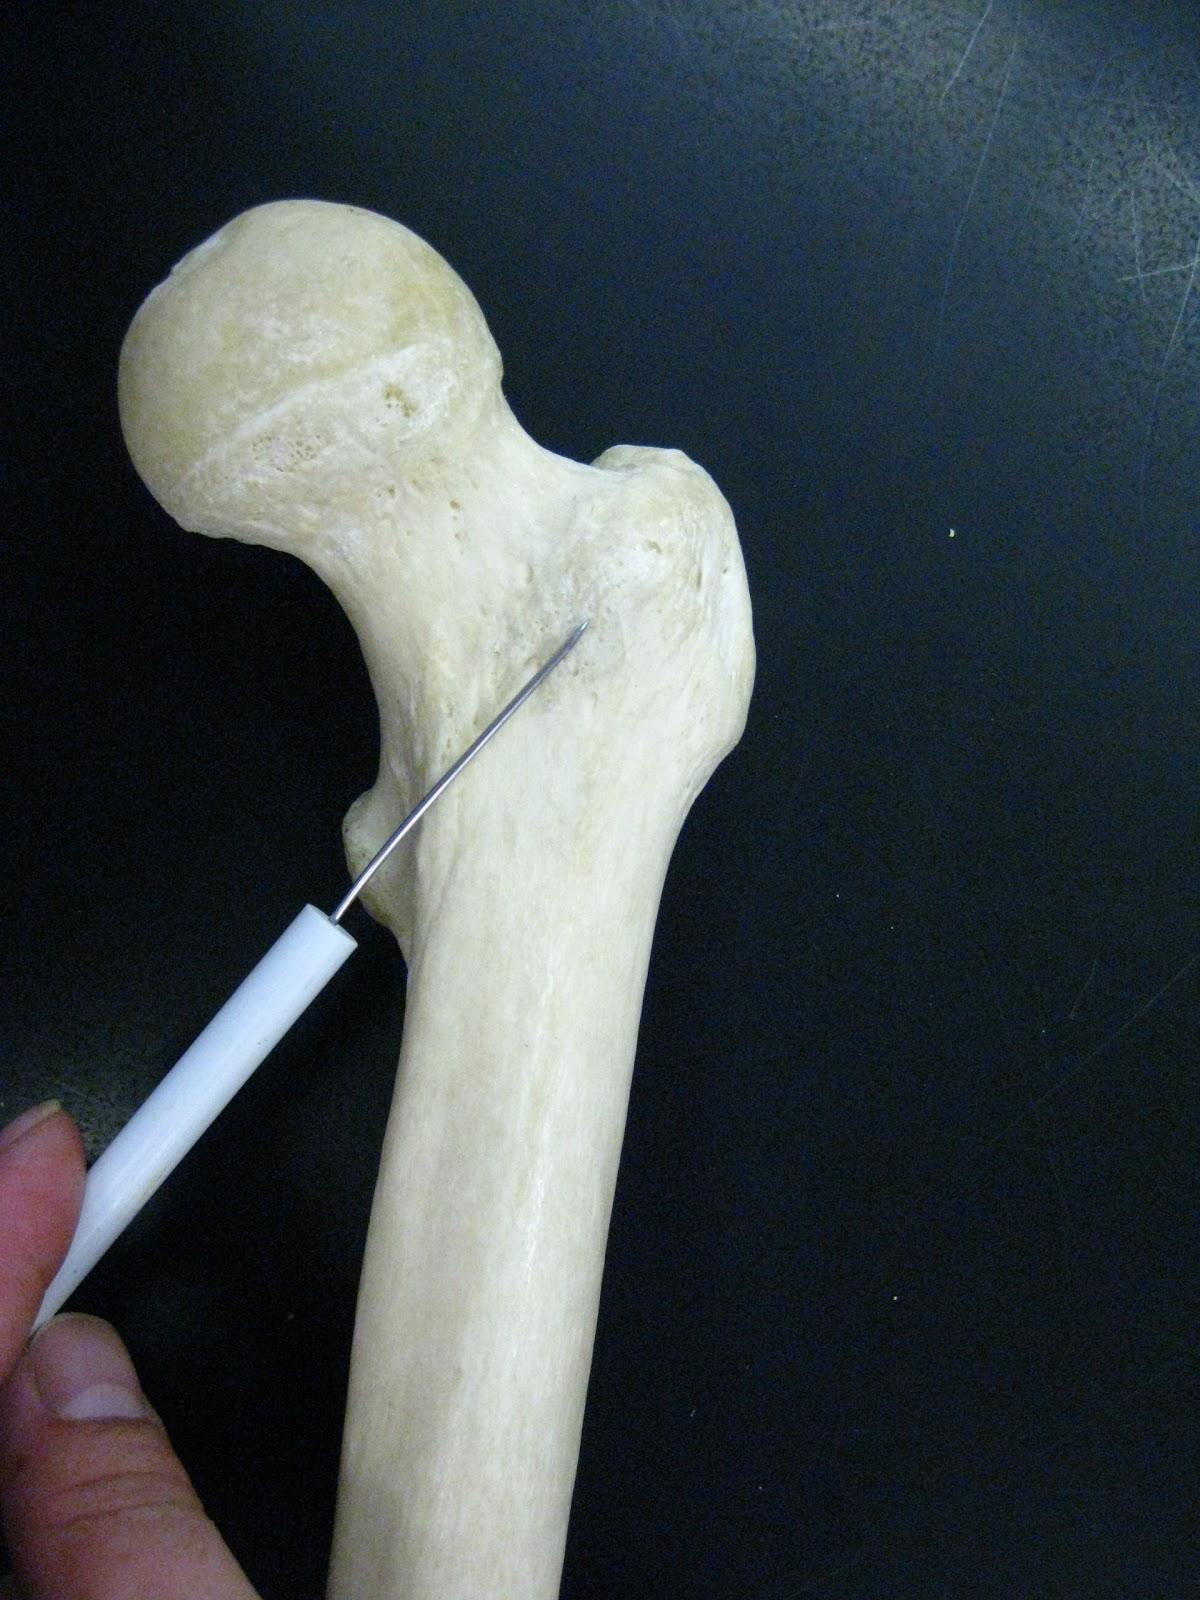 Human anatomy vascular system